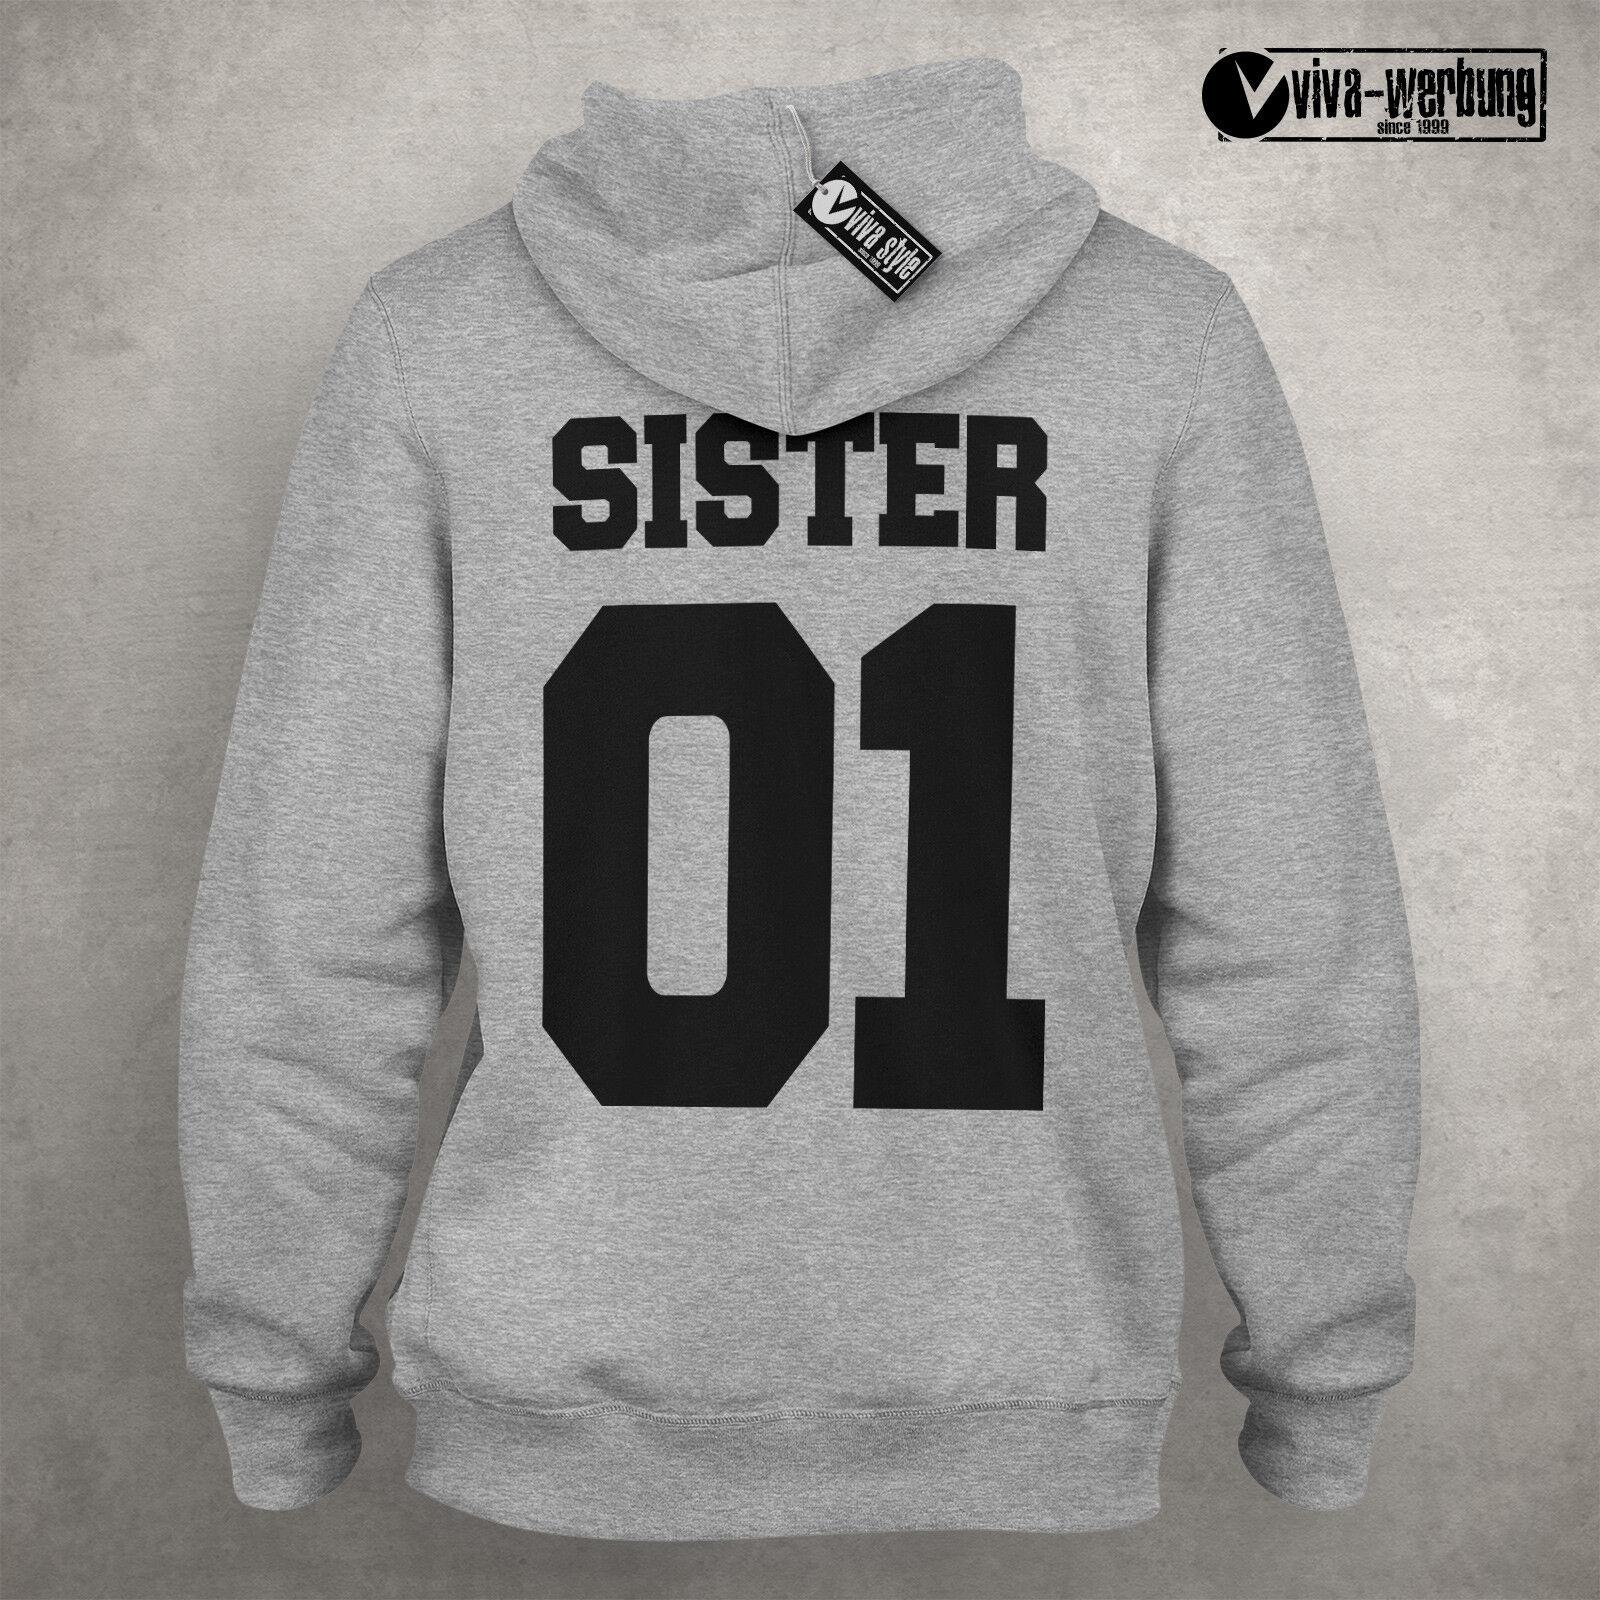 Sister 01 01 01 Pulli Deluxe Best Friends Beste Freundin Hoodie Pulli Geschenk Sweat G | Ruf zuerst  97ee6c